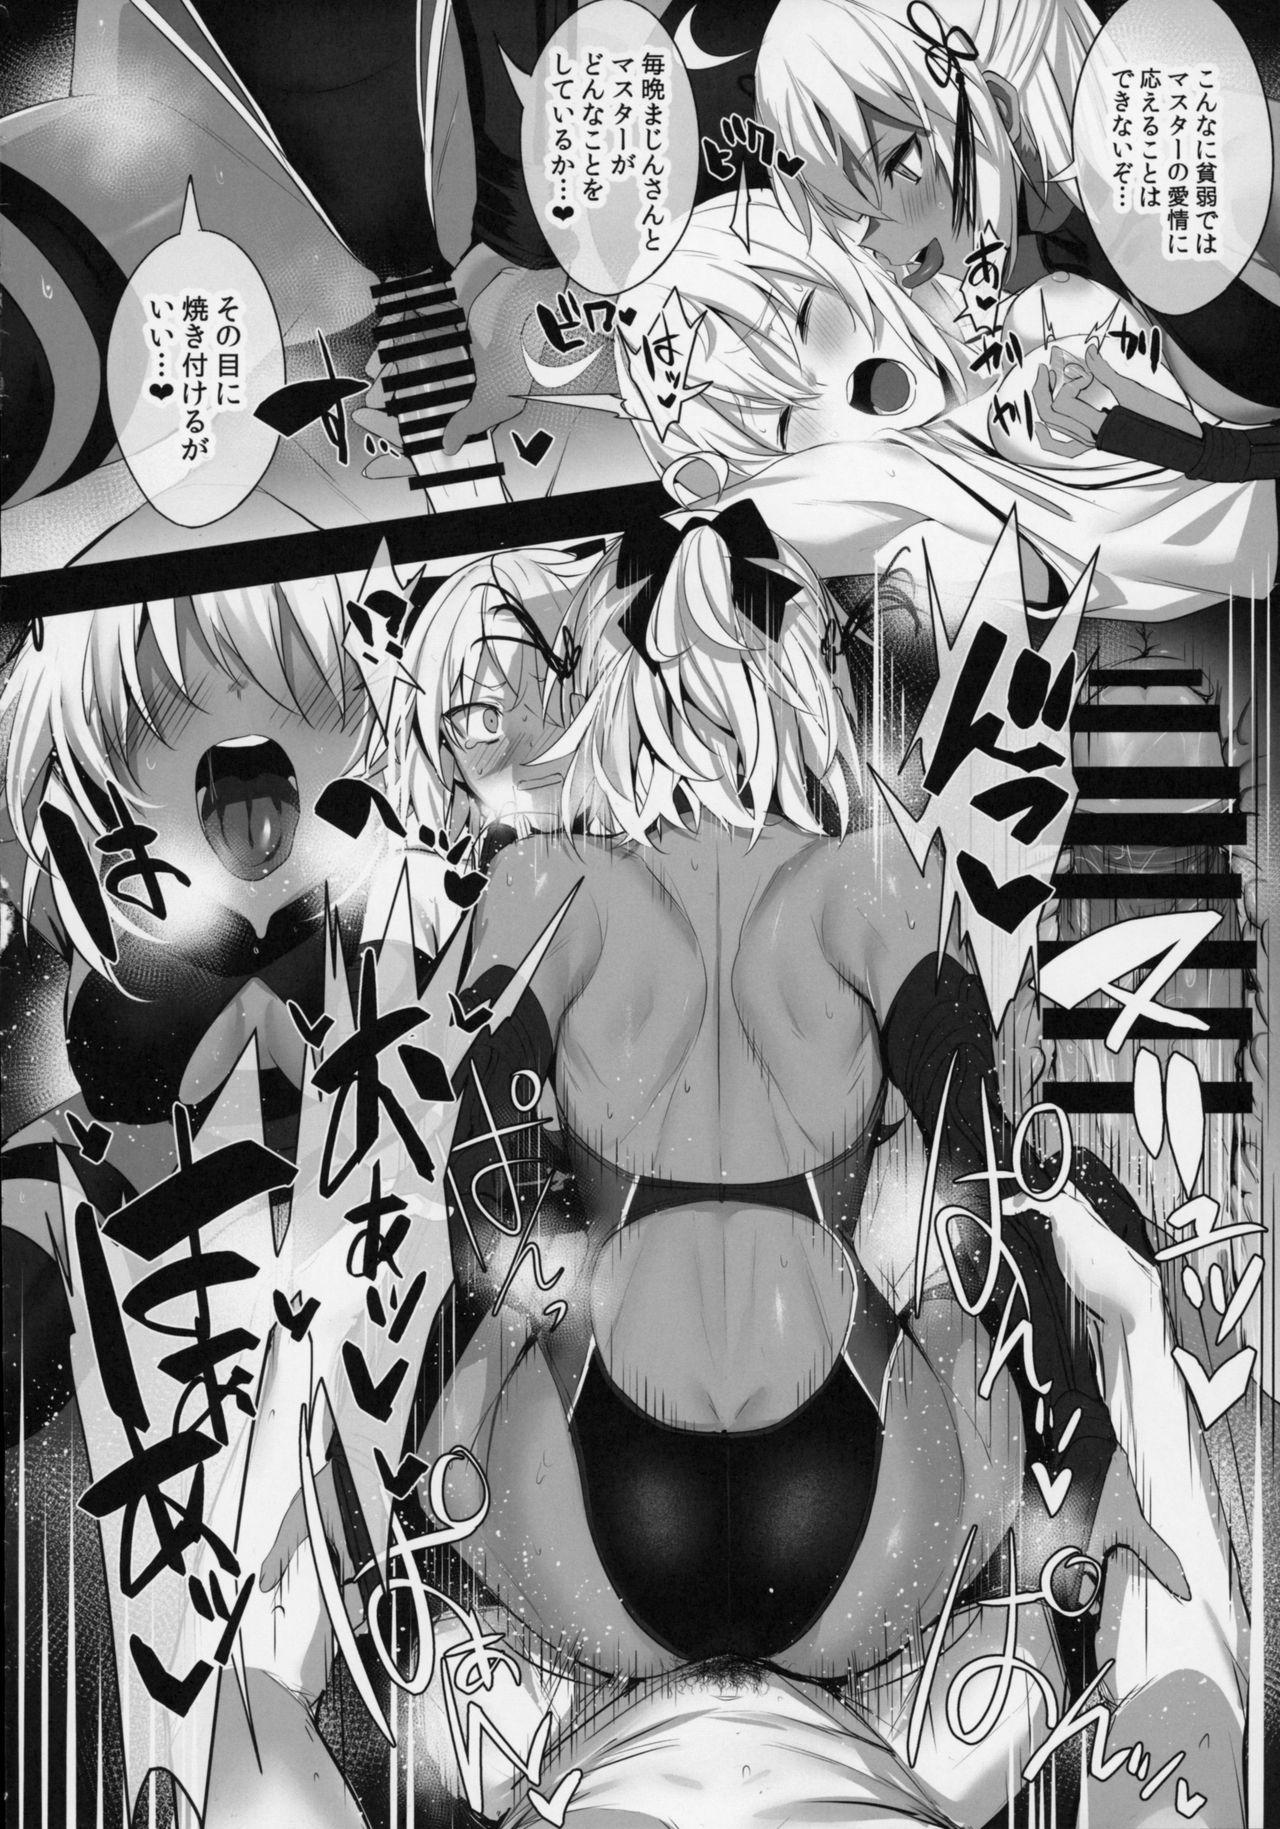 Okita-san wa Mizugi ga Kitai 14